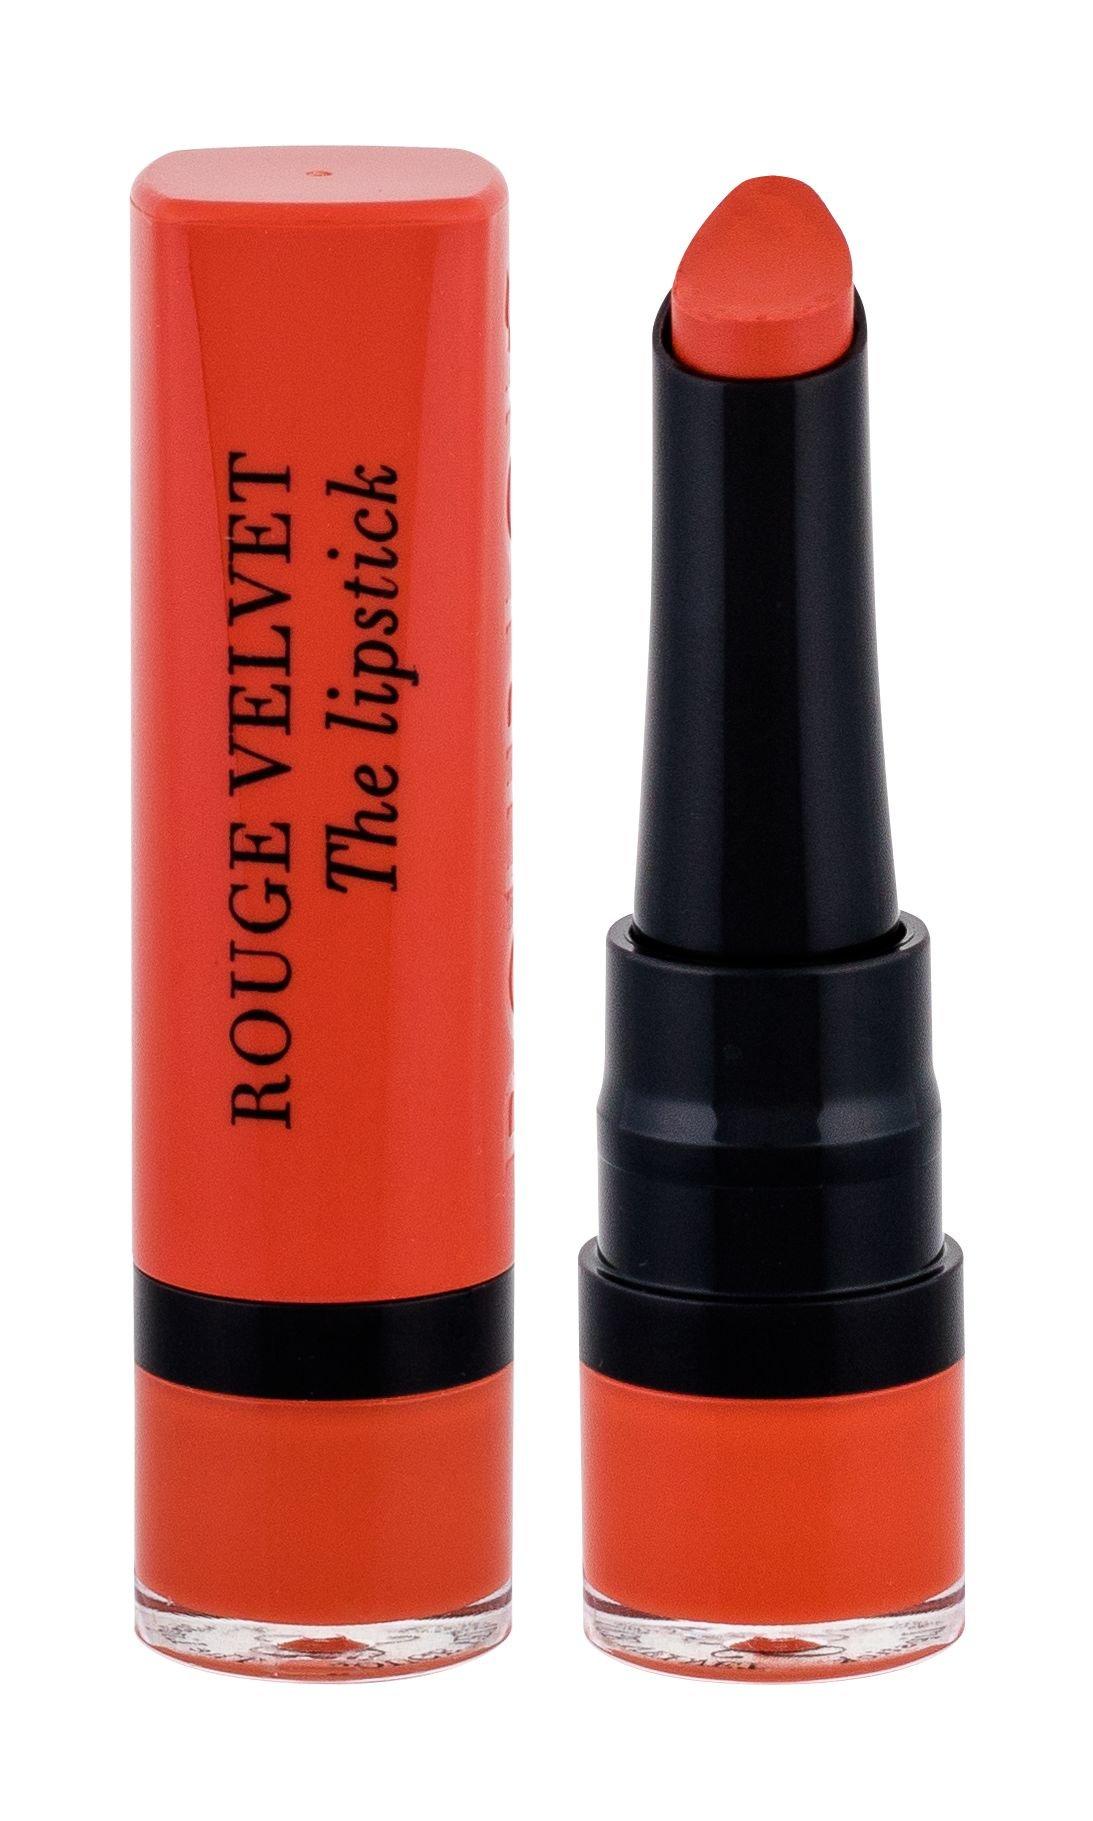 BOURJOIS Paris Rouge Velvet Lipstick 2,4ml 06 Abrico´dabra!